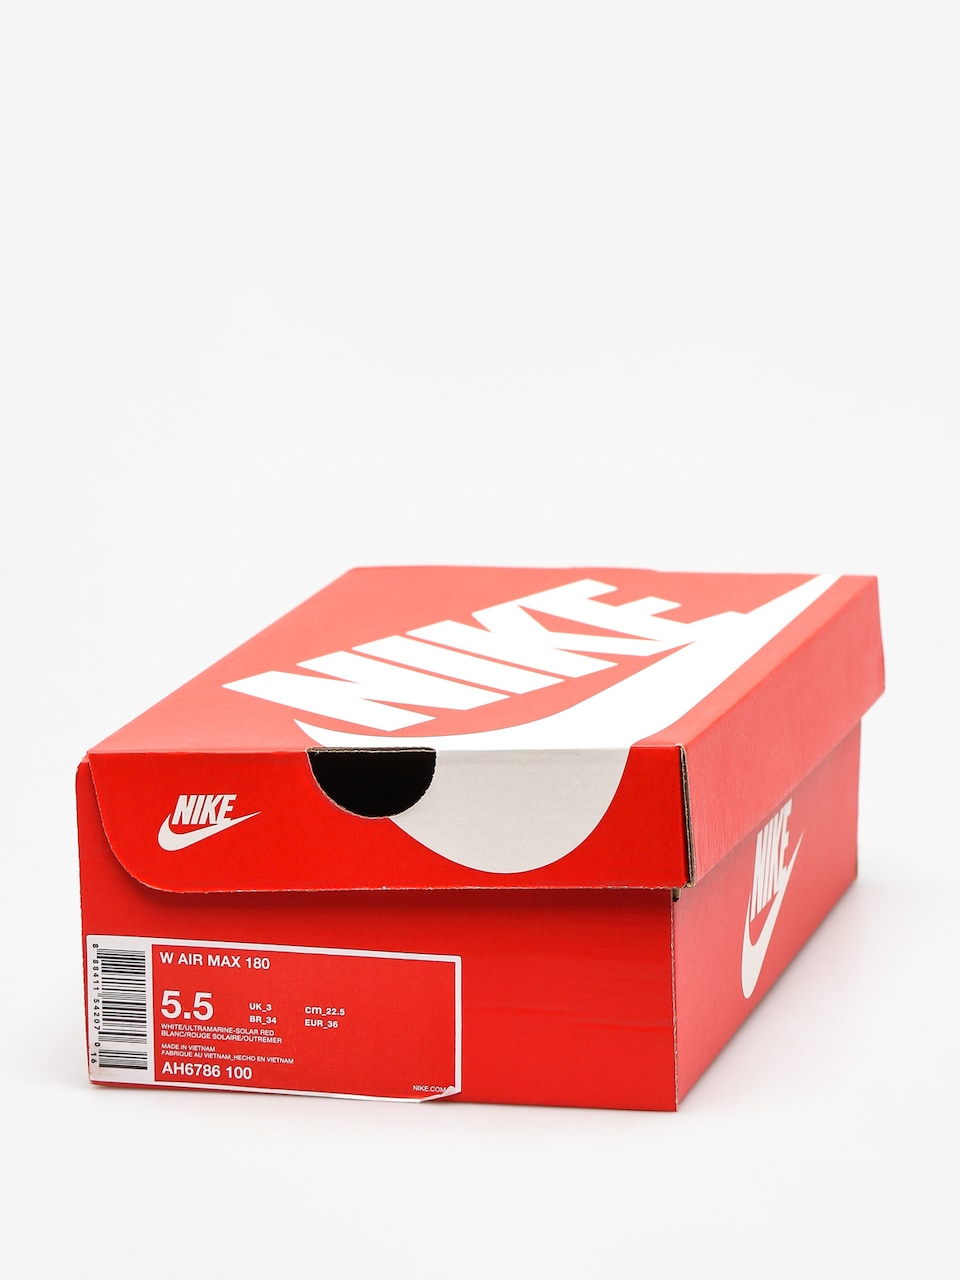 Buty Nike Air Max 180 Wmn (whiteultramarine solar red black)